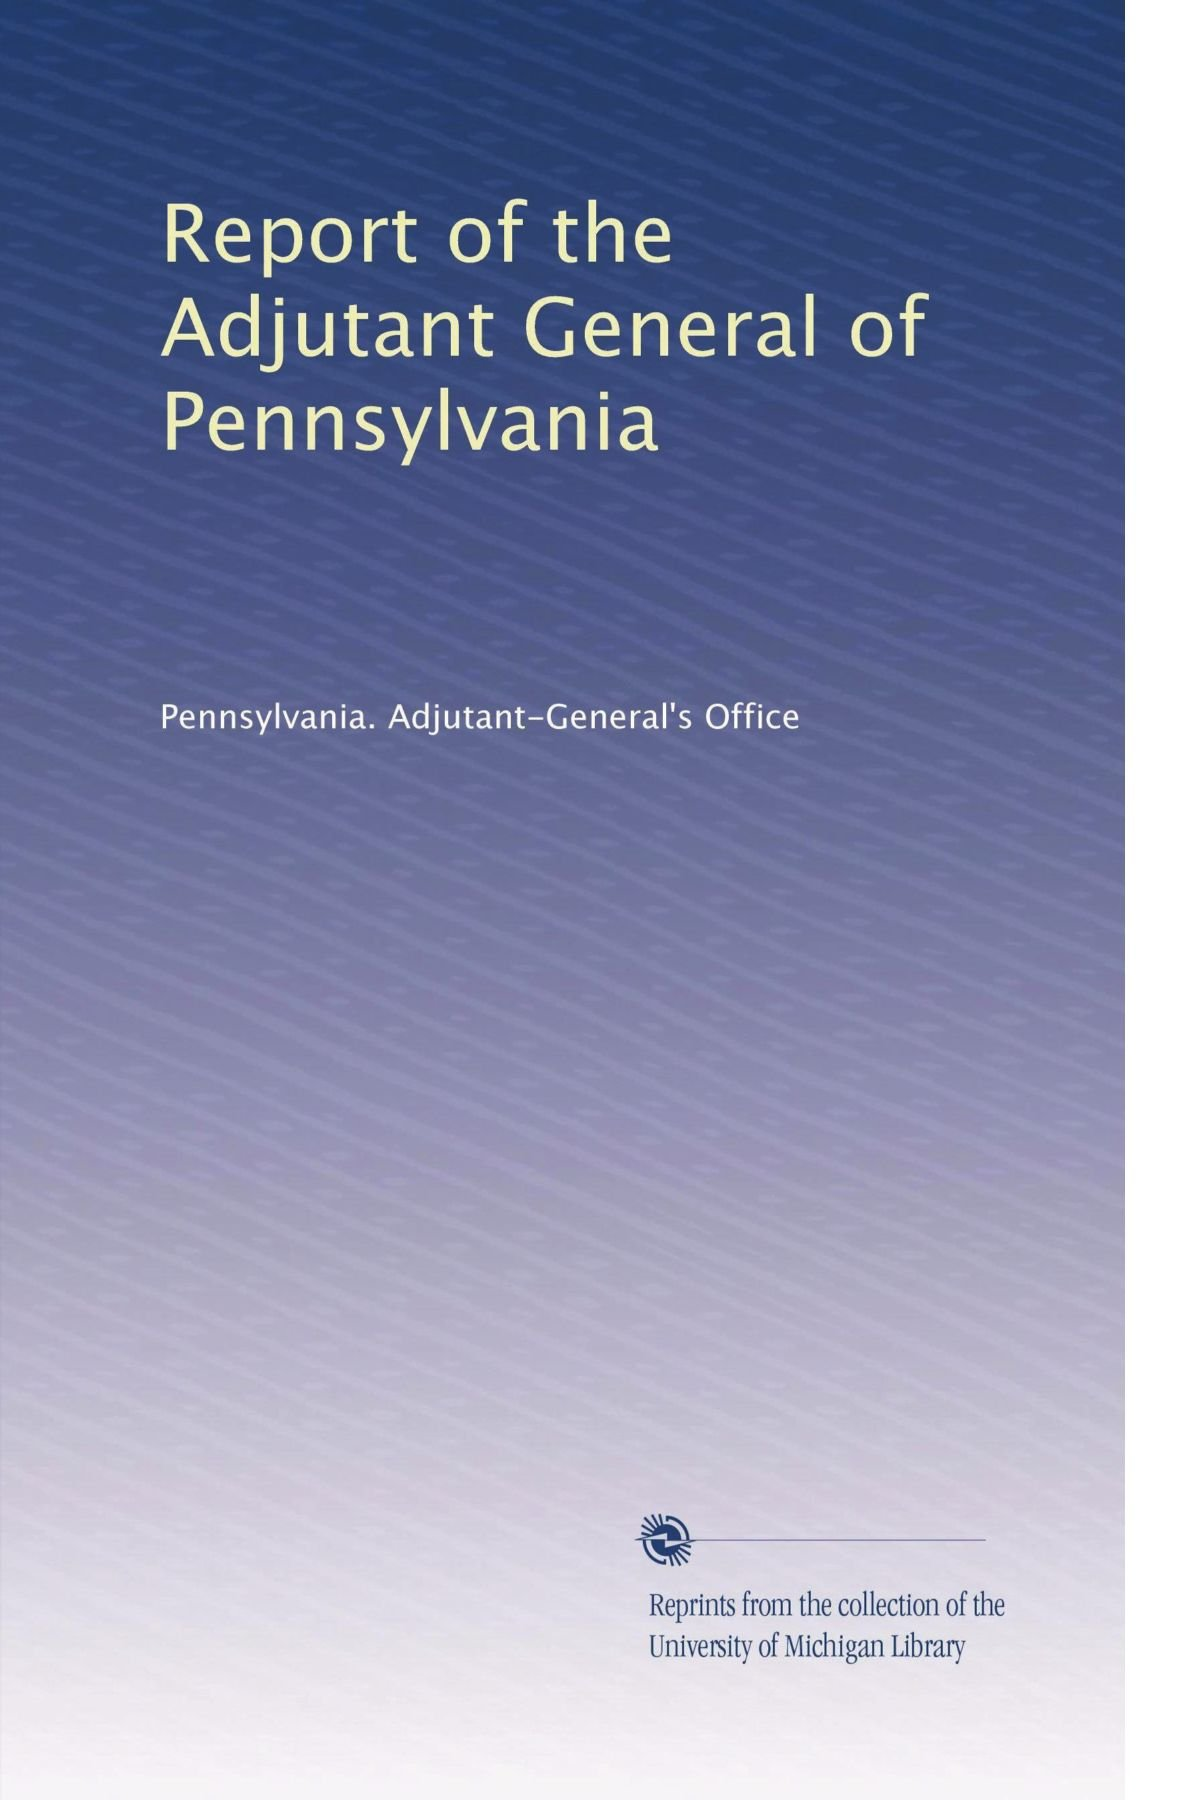 Report of the Adjutant General of Pennsylvania (Volume 30) PDF